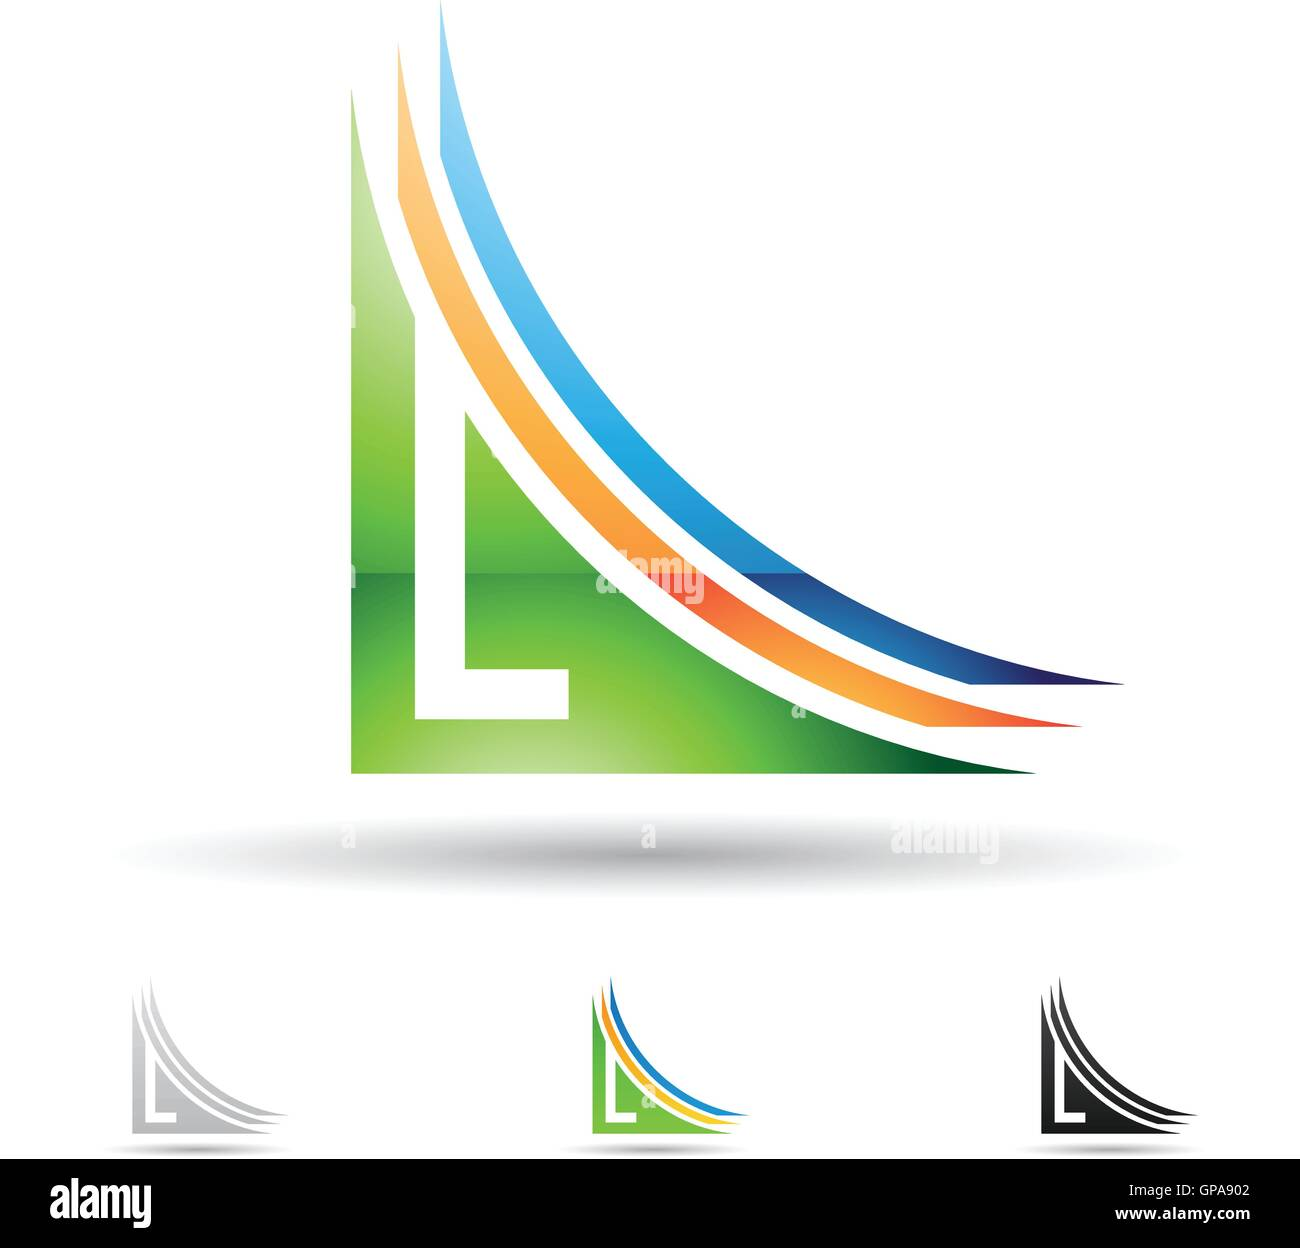 Letter L Logo Stock Photos & Letter L Logo Stock Images - Alamy